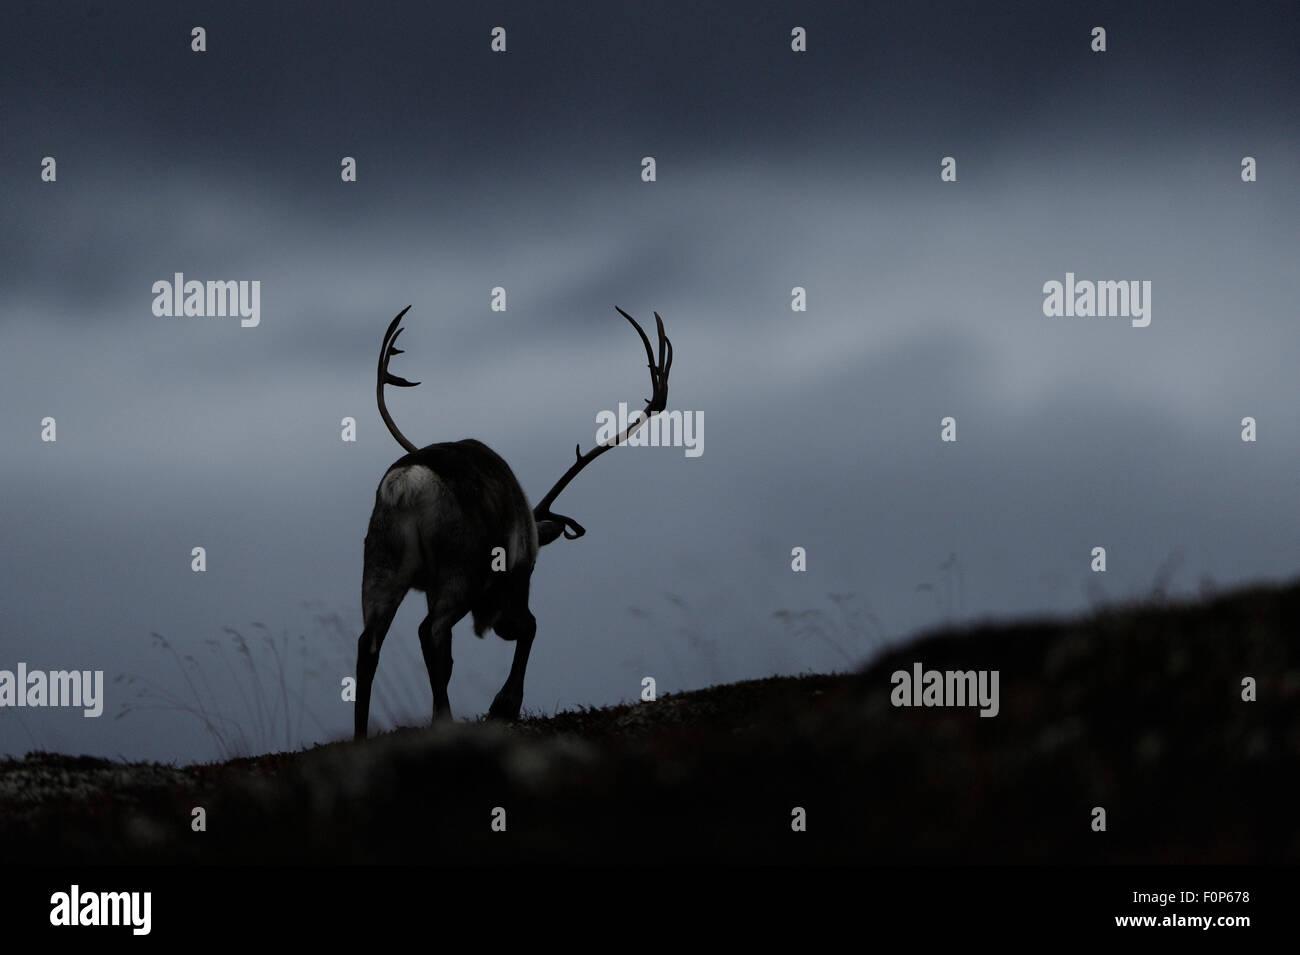 Silhouettet de renos (Rangifer tarandus) Vista trasera, Walking away, manada salvaje, el Parque Nacional de Forollhogna, Imagen De Stock